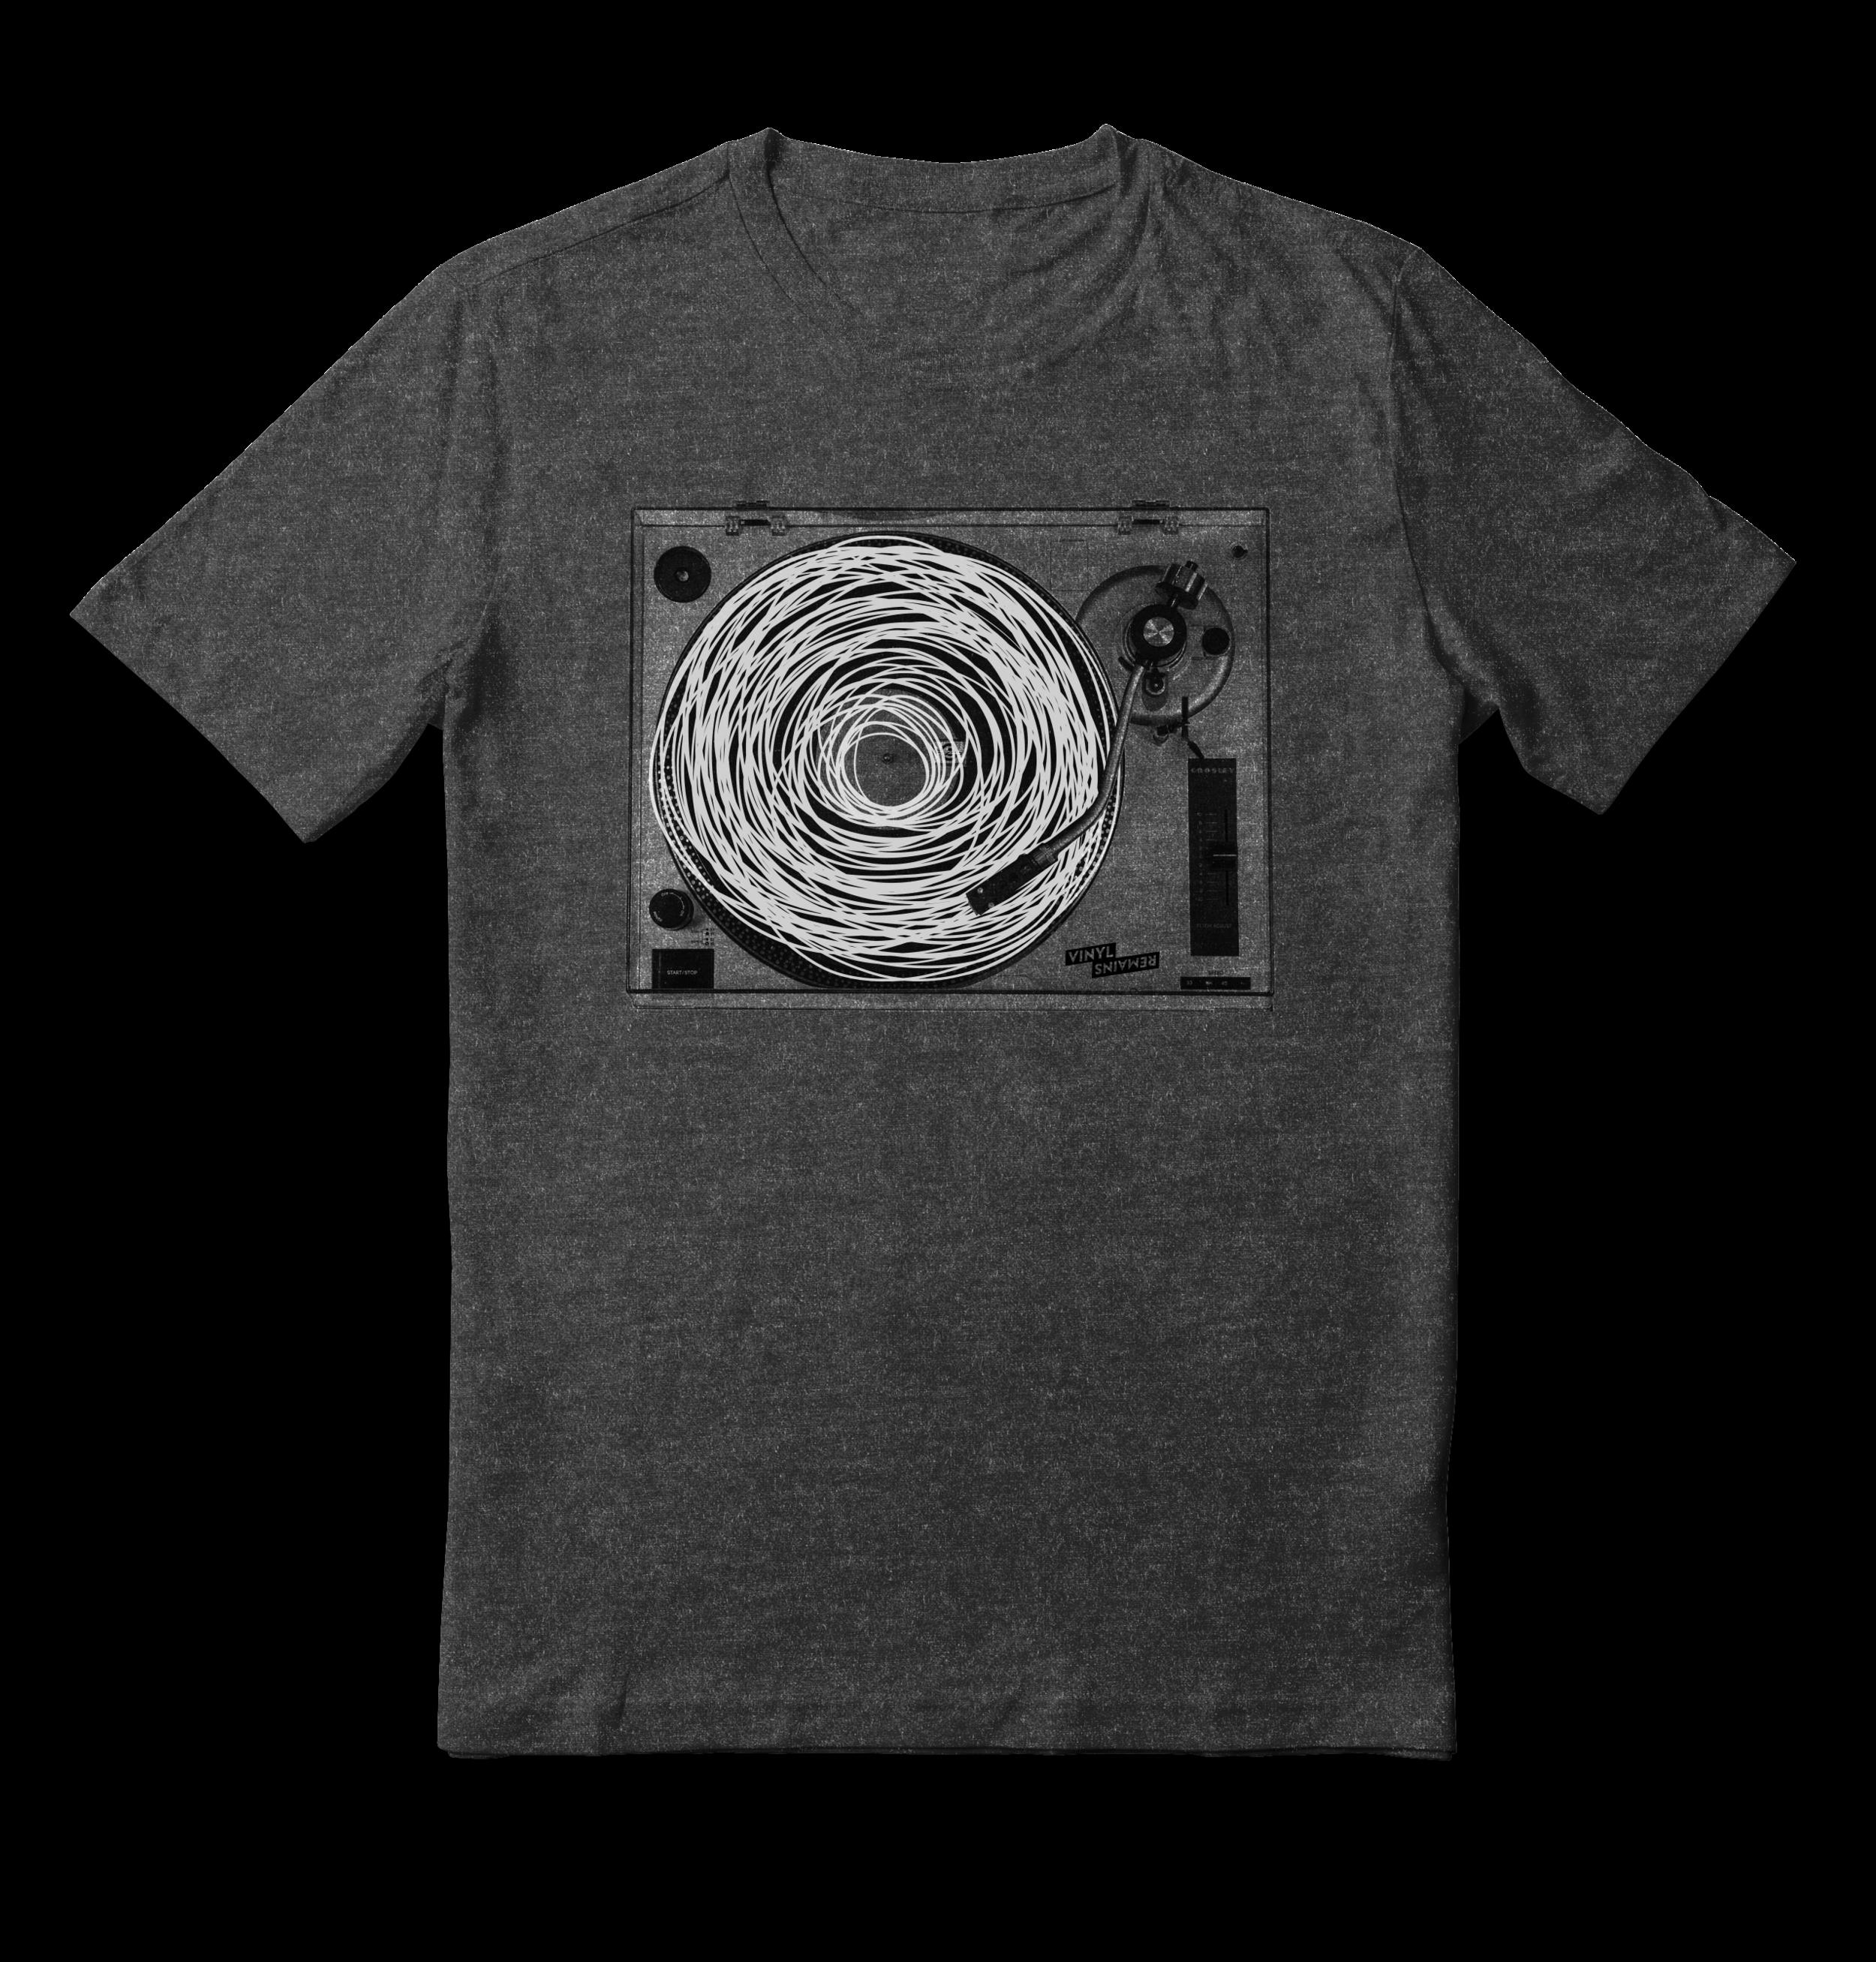 vinyl_remains_shirt1_bootstrap_design_co.png